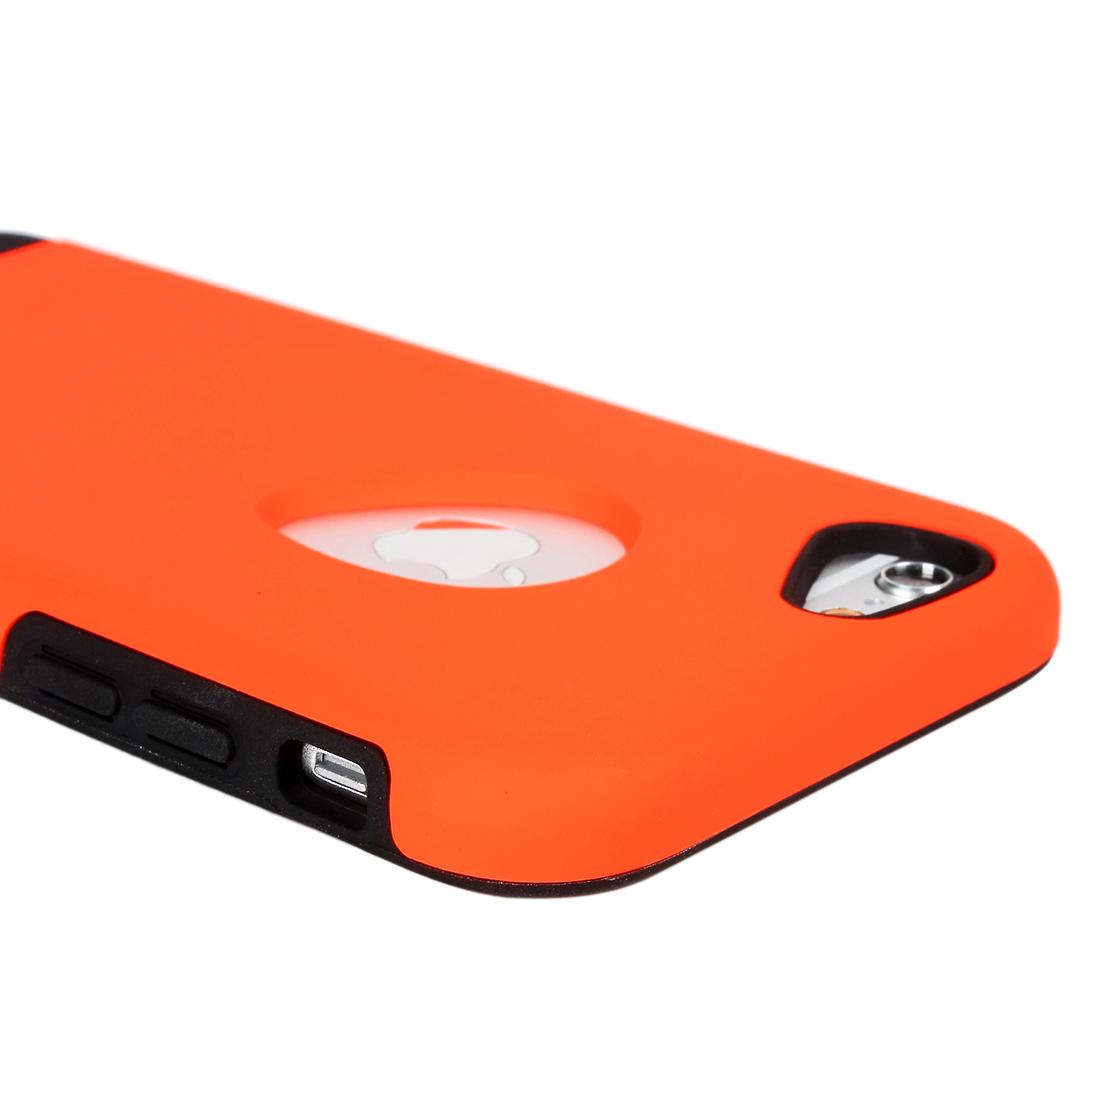 for Iphone 6 Case Combo Hybrid Shockproof Hard Cover Orange